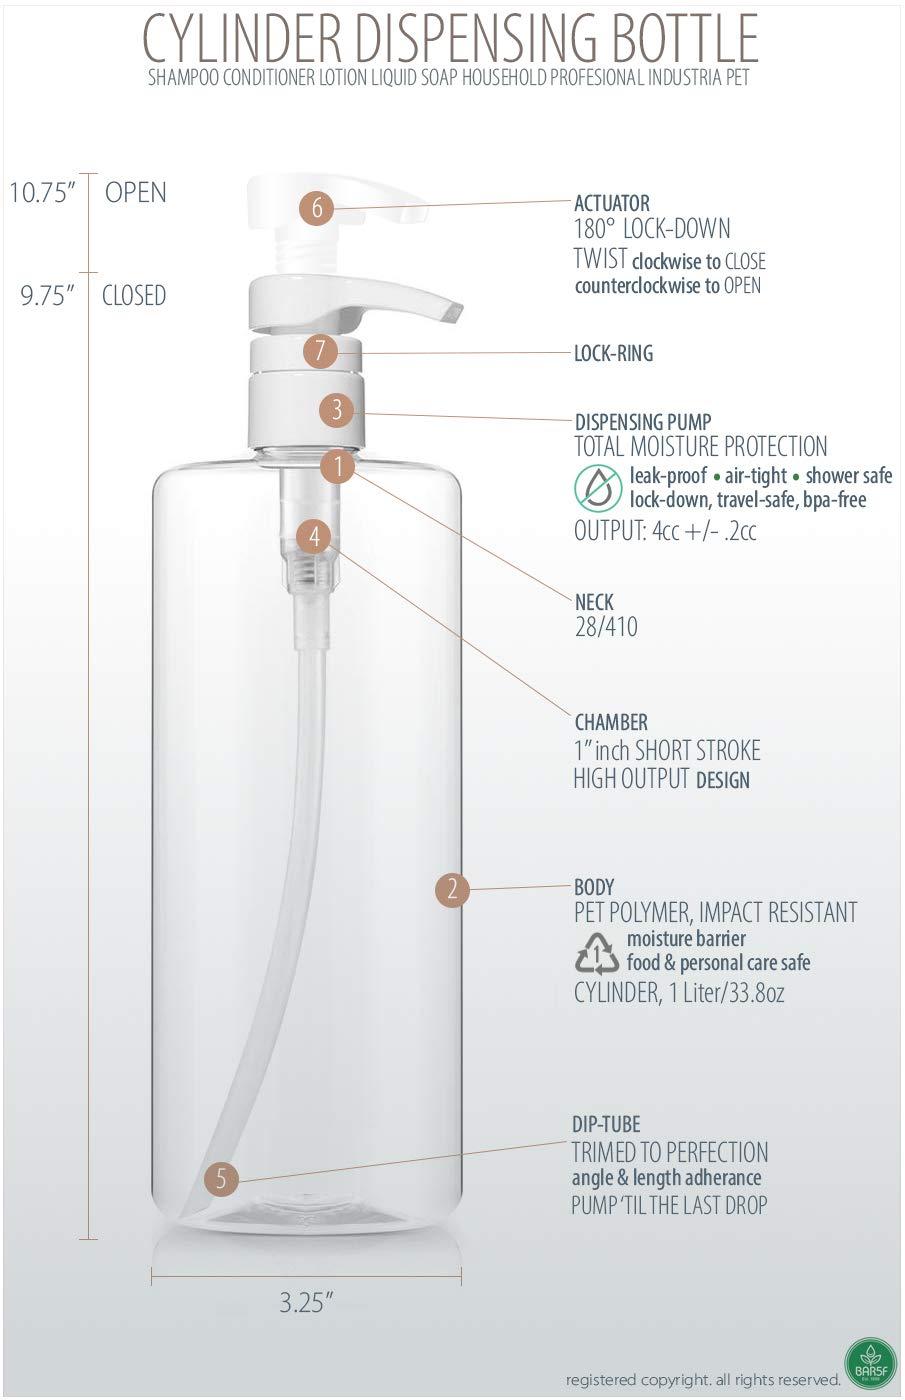 32oz Cylinder PETE1 Pack of 3 1Liter Plastic Empty Shampoo Pump Bottles BPA-FREE